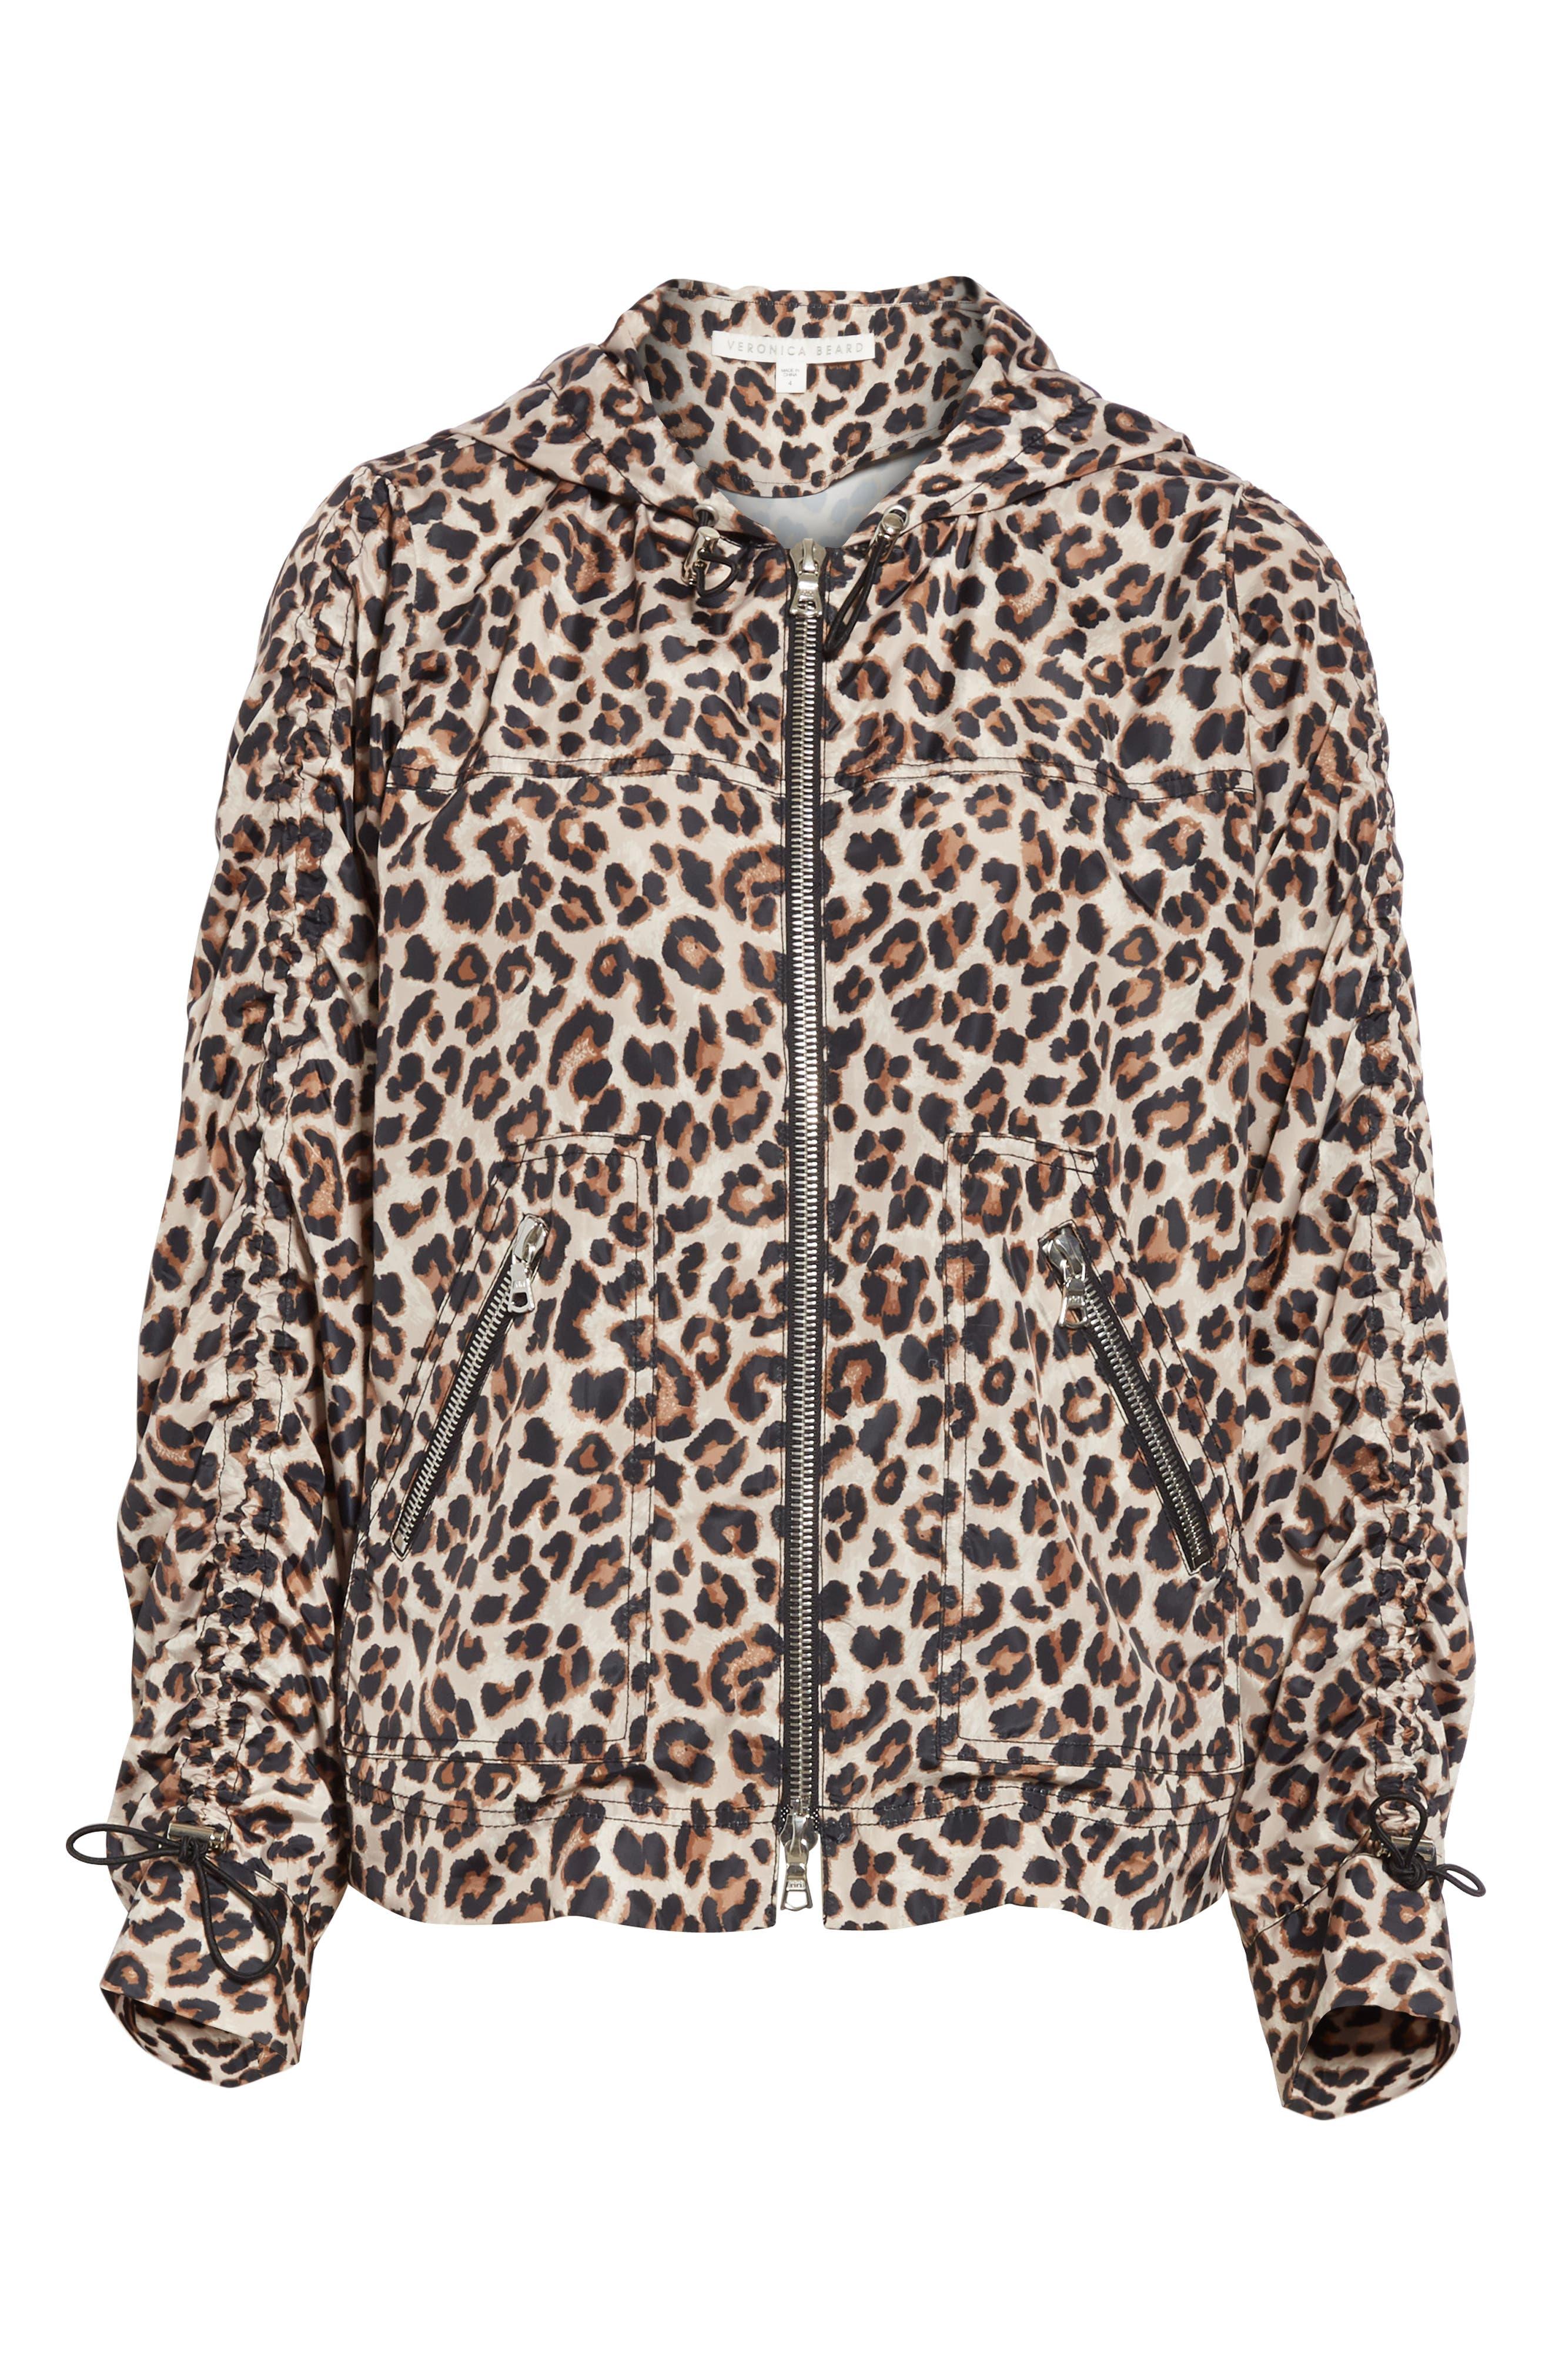 Sibila Leopard Print Jacket,                             Alternate thumbnail 5, color,                             200